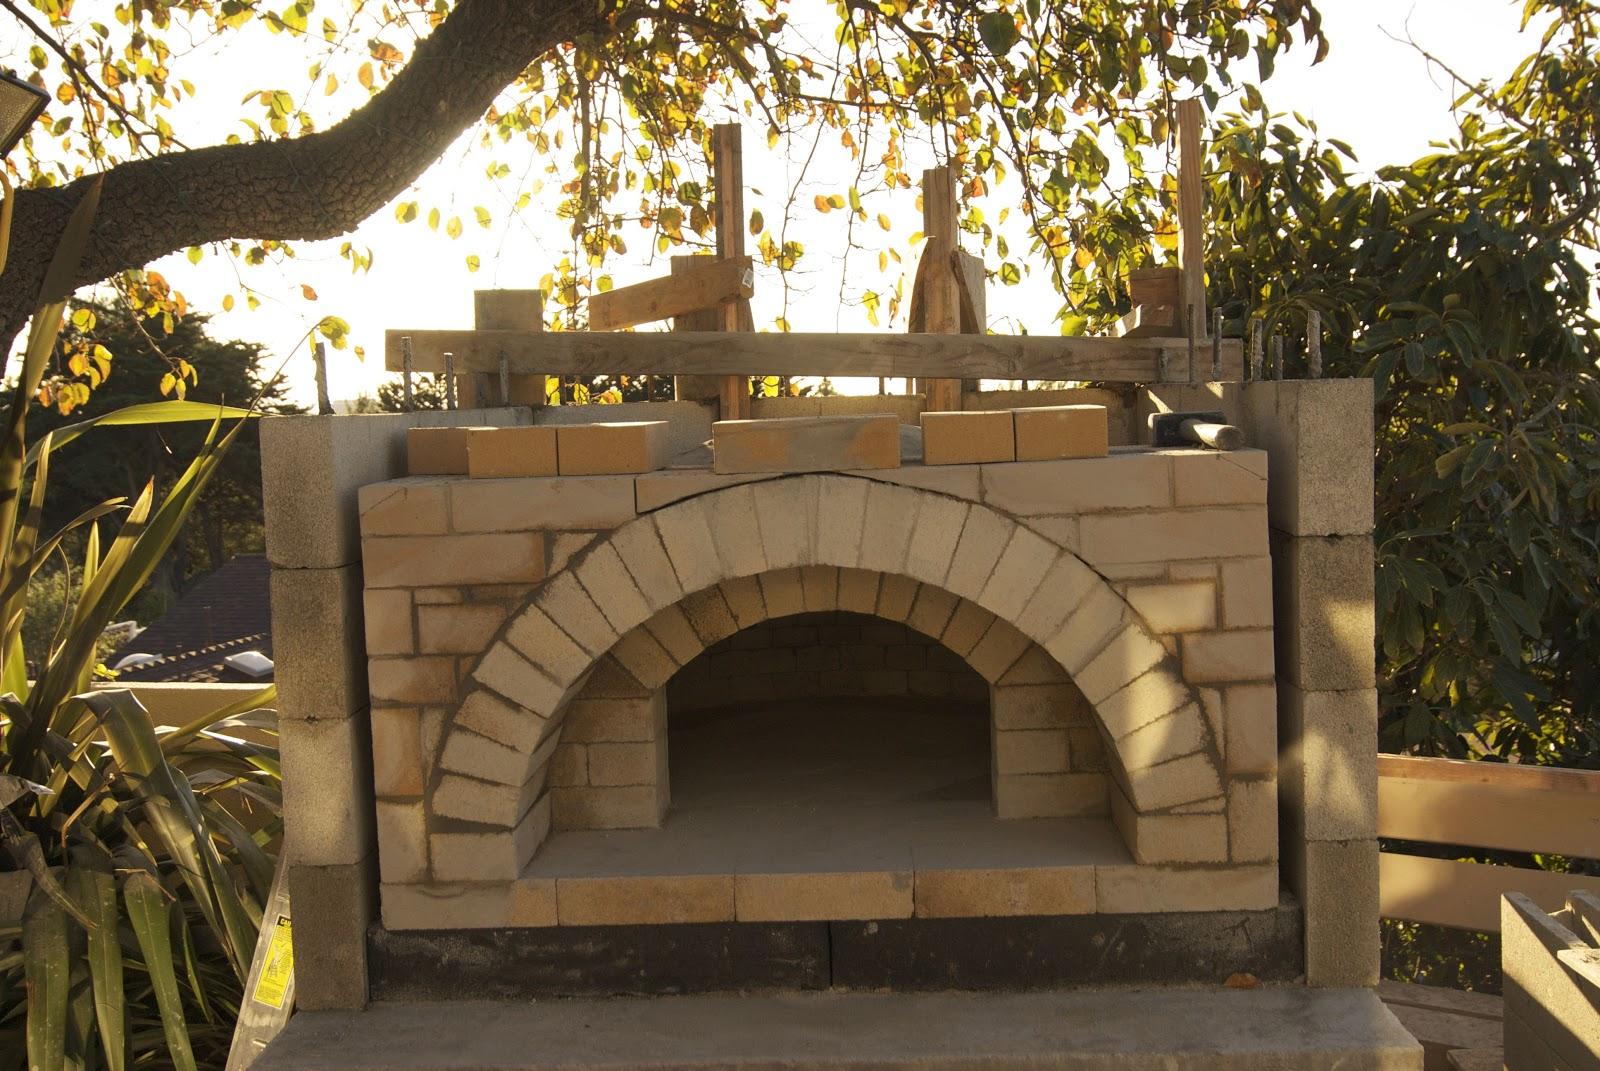 True Brick Ovens: Build Your Own Brick Oven